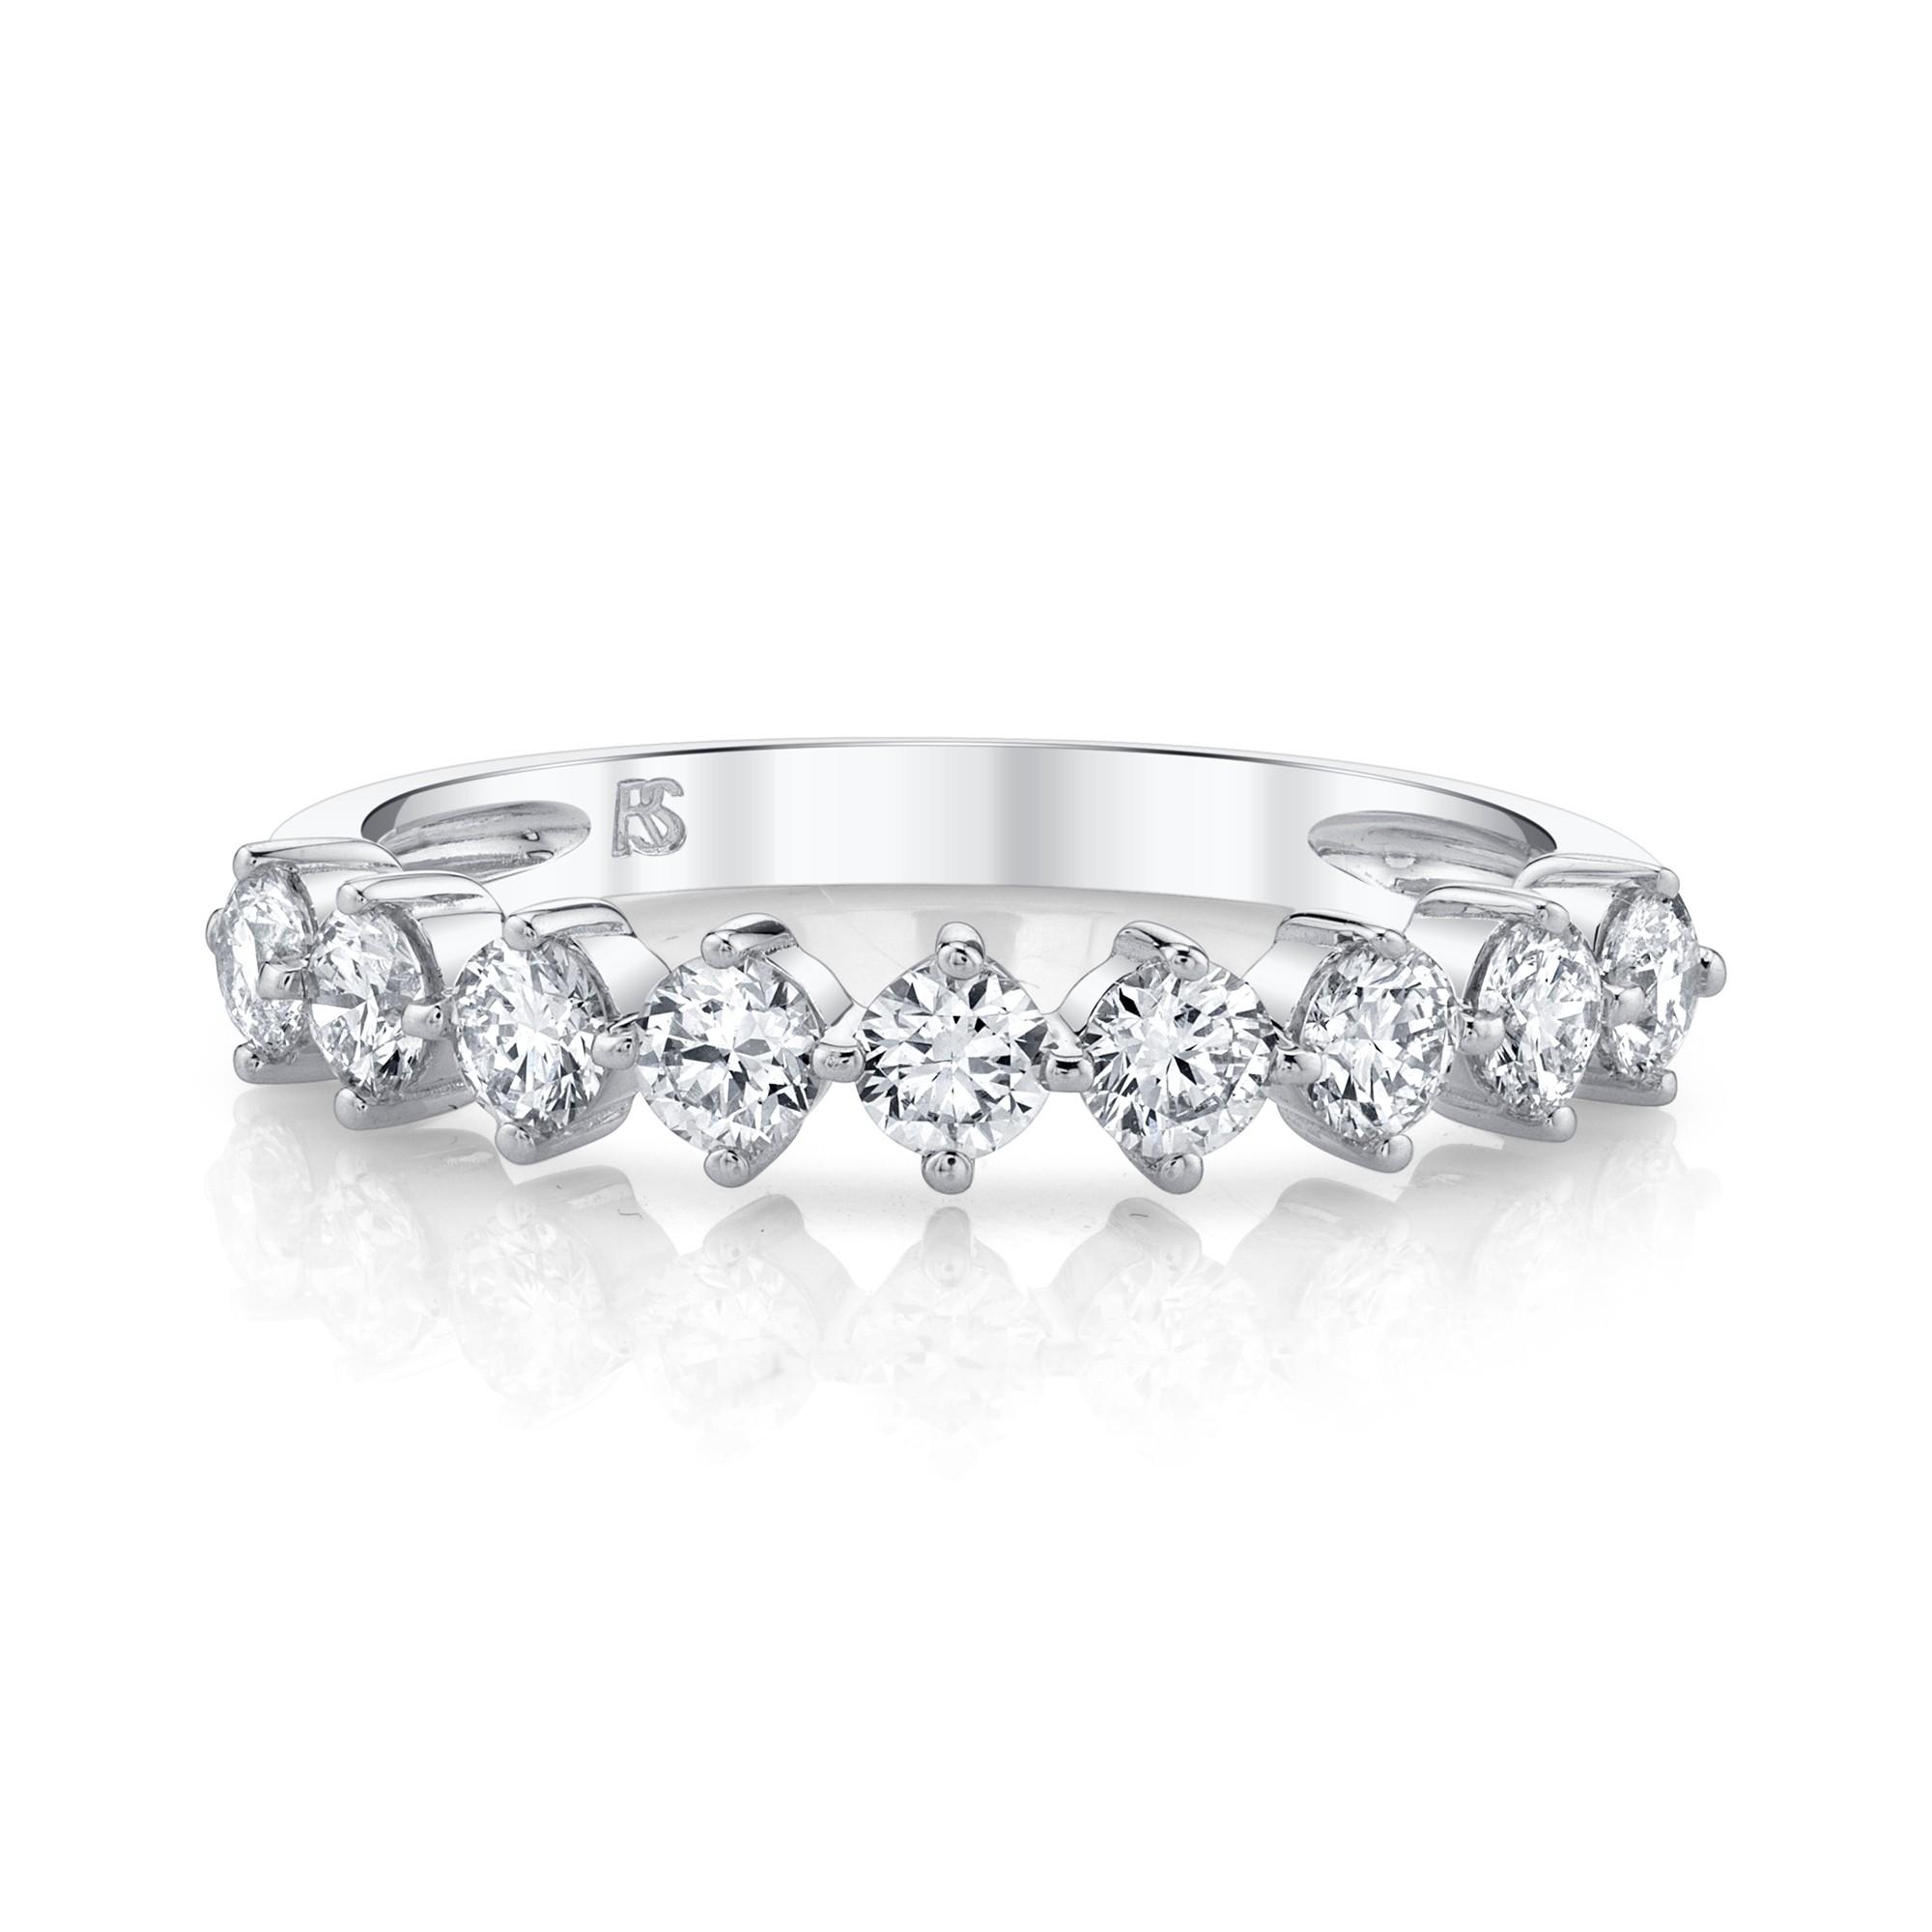 14k White Gold Diamond Compass Set Ring